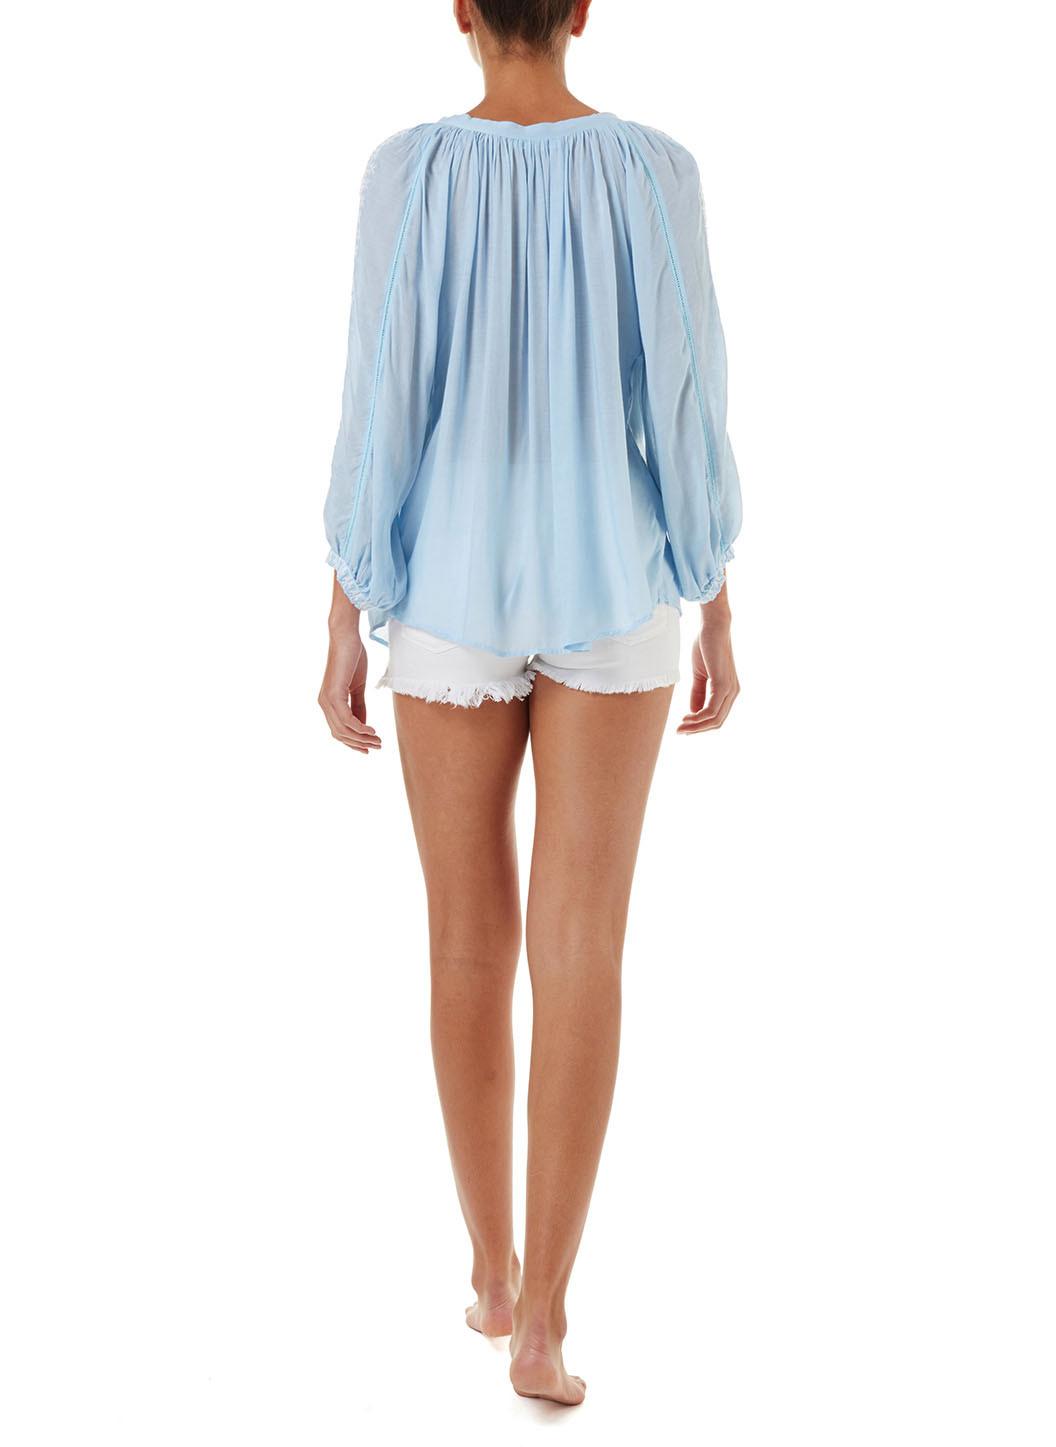 simona-maya-white-laceup-embroidered-blouse-2019-b